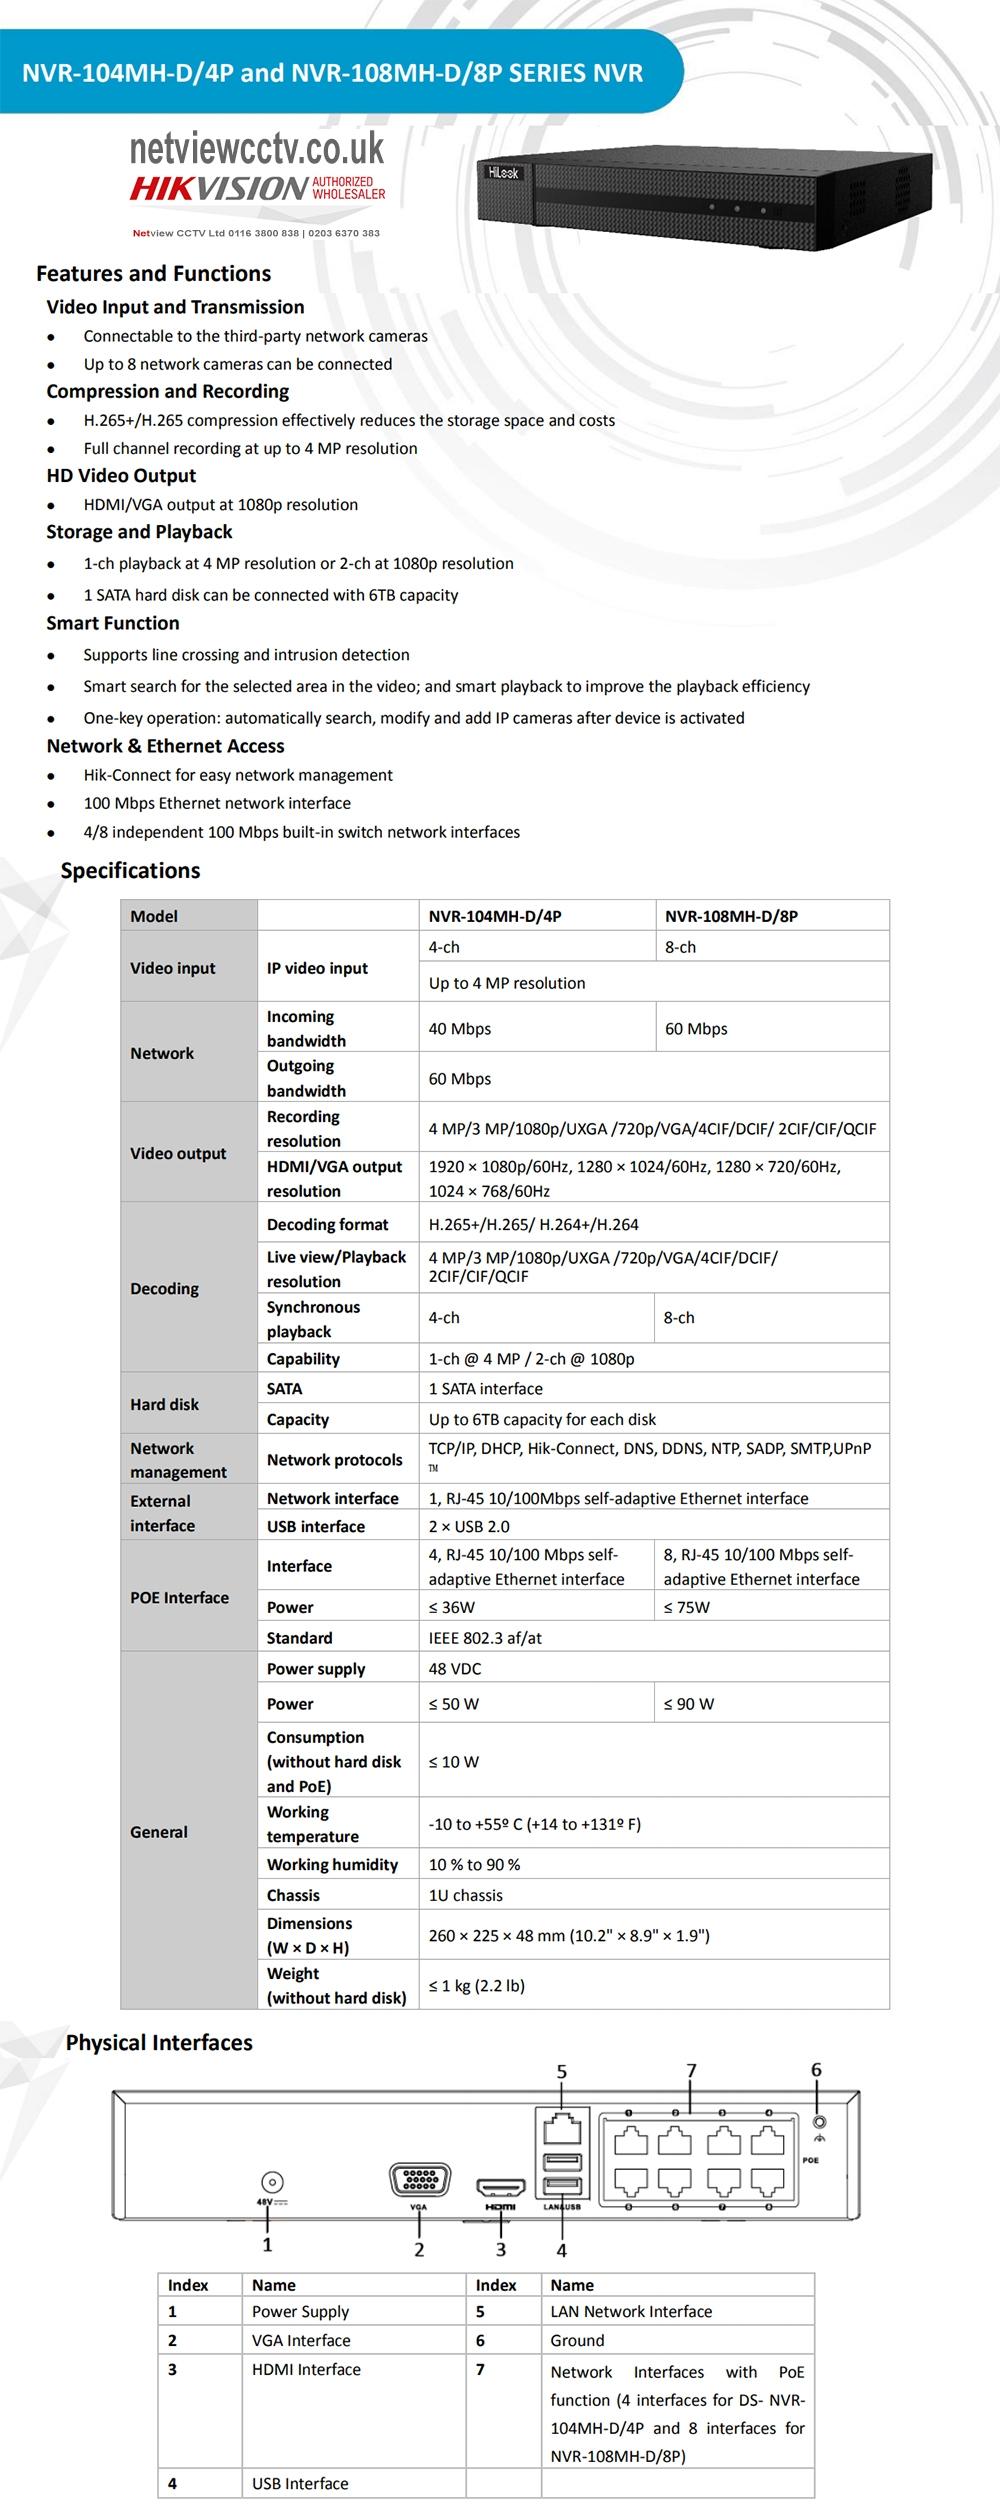 HiLook NVR-104MH-D/4P & NVR-108MH-D/8P HiLook 8x4MP PoE NVR